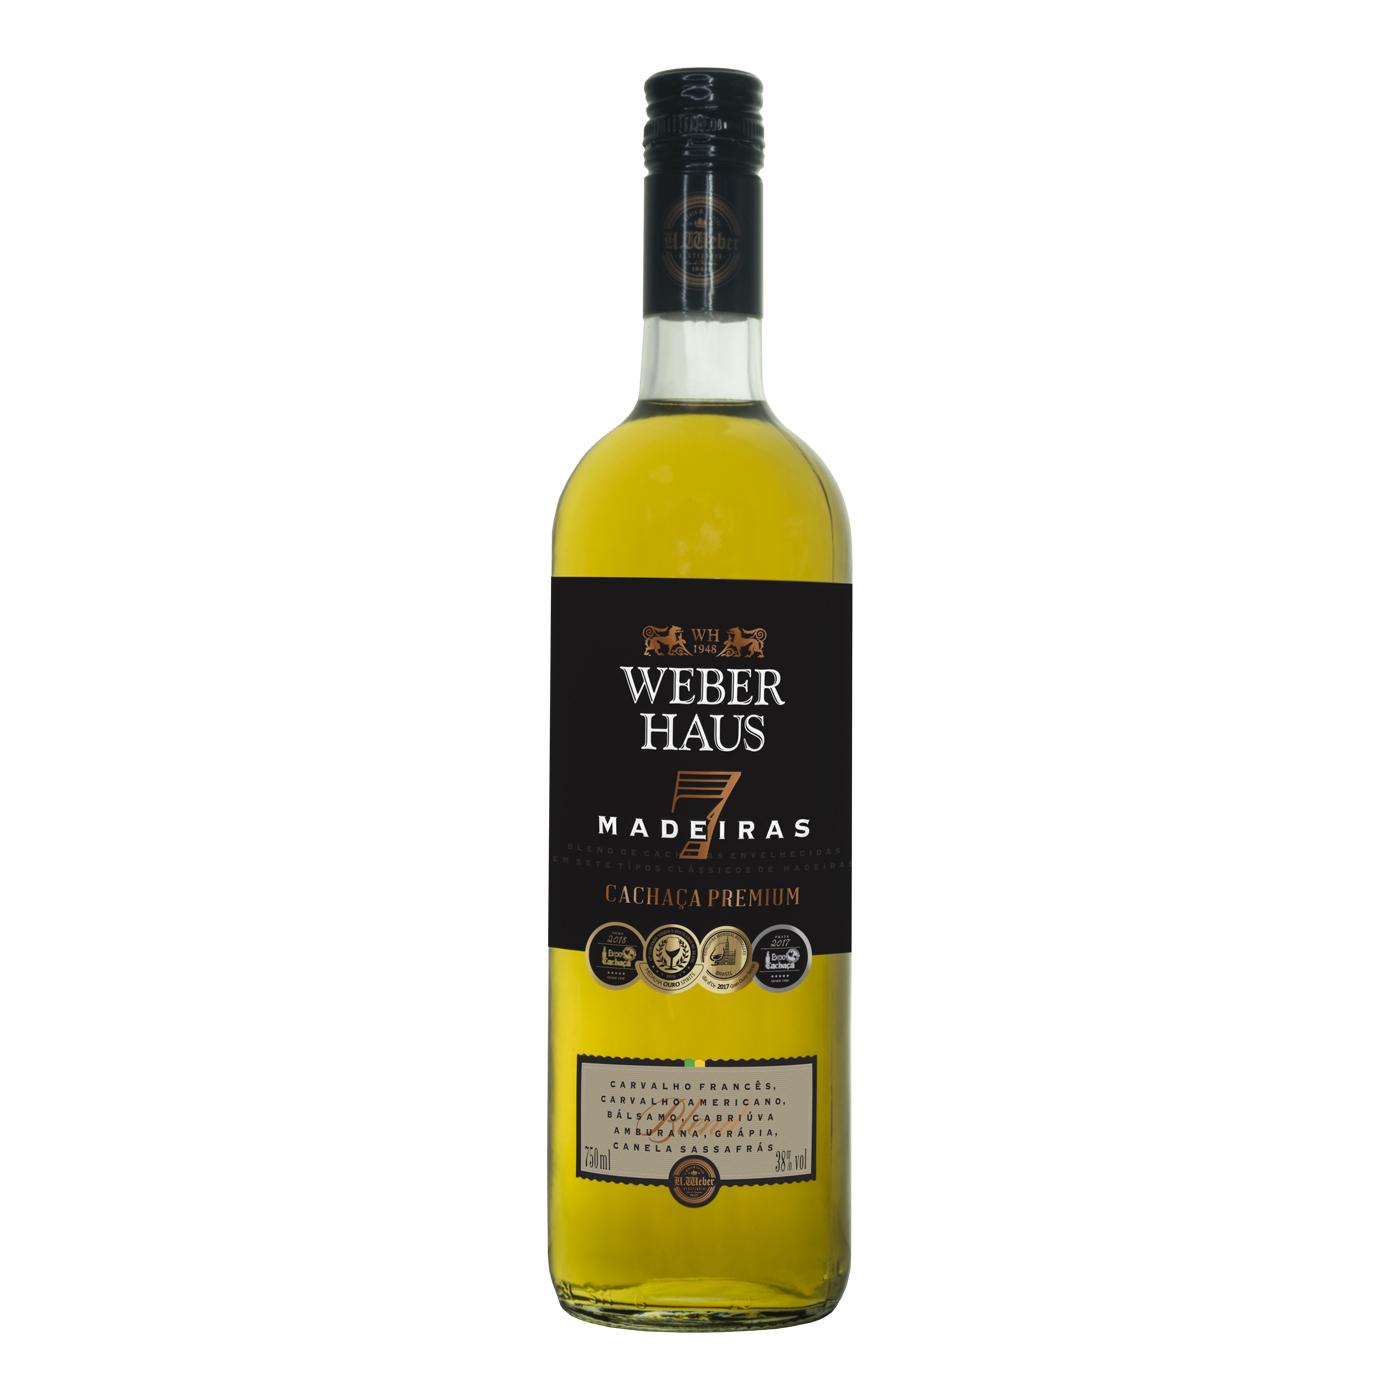 Cachaça Weber Haus Premium 7 Madeiras - 750ml